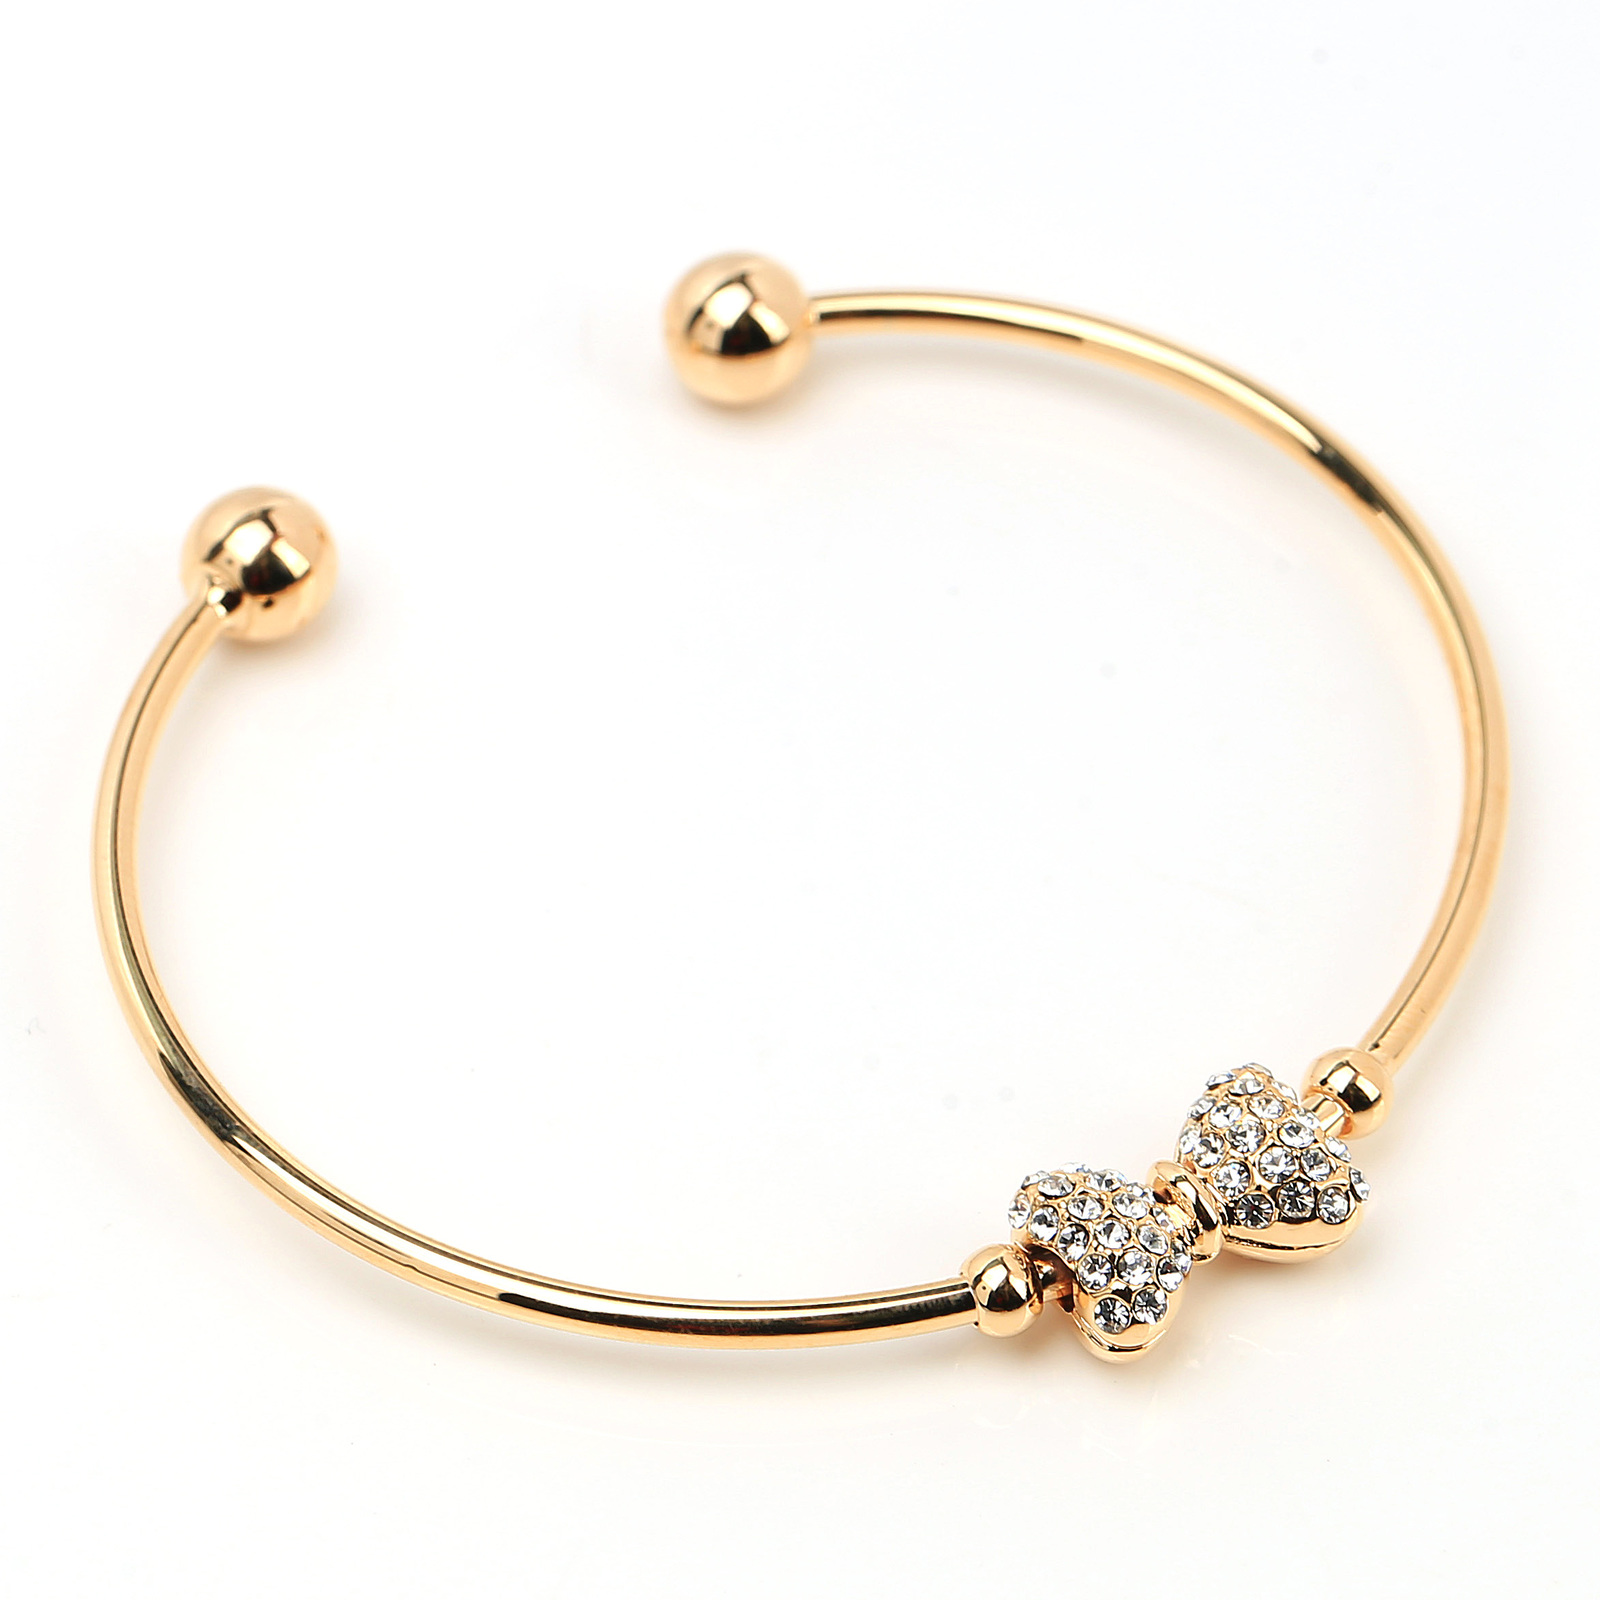 UE- Trendy Gold Tone Designer Bangle Bracelet With Swarovski Style Crystal Bow